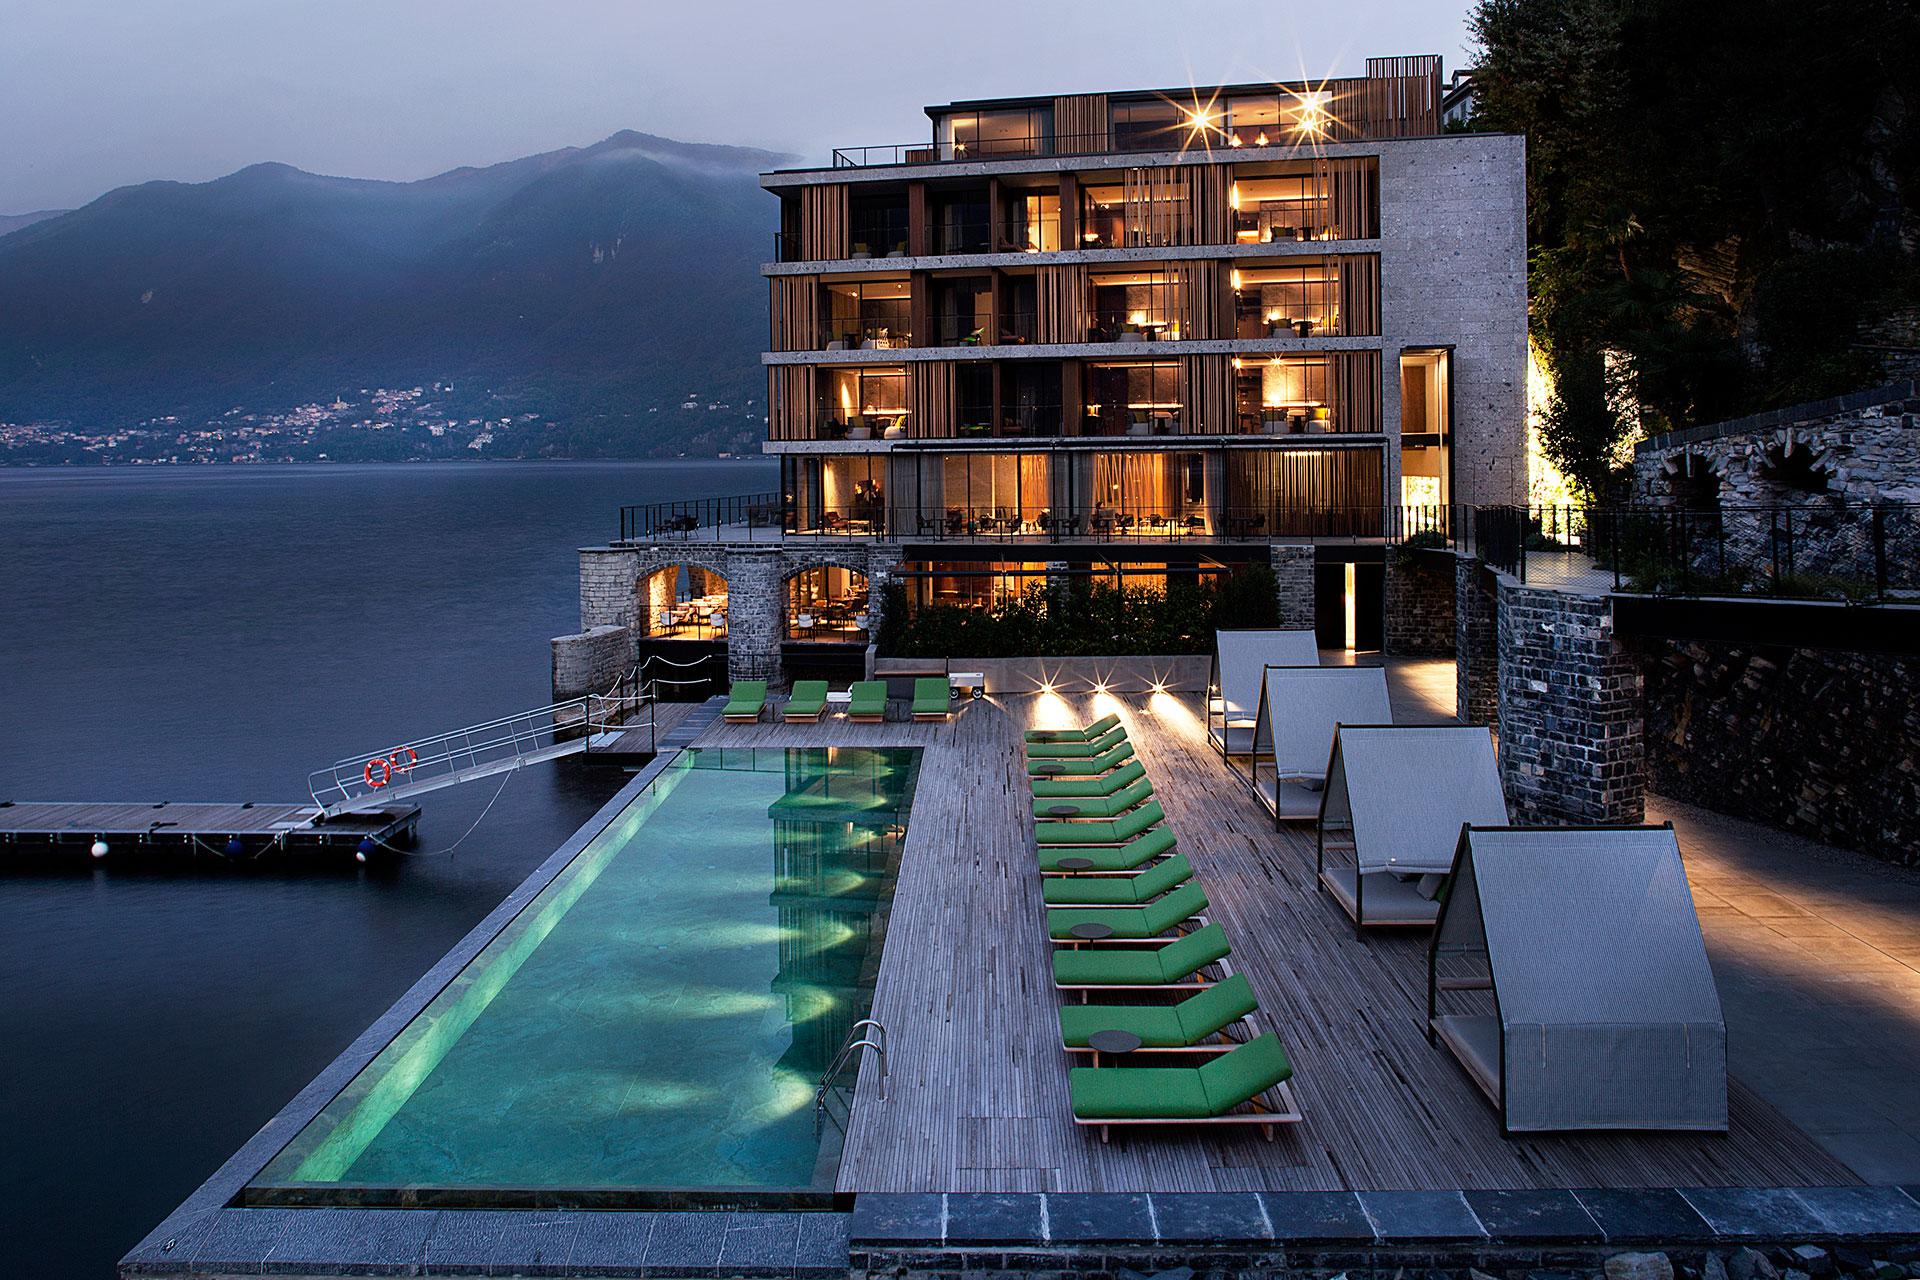 HOTEL LE SERENO 4